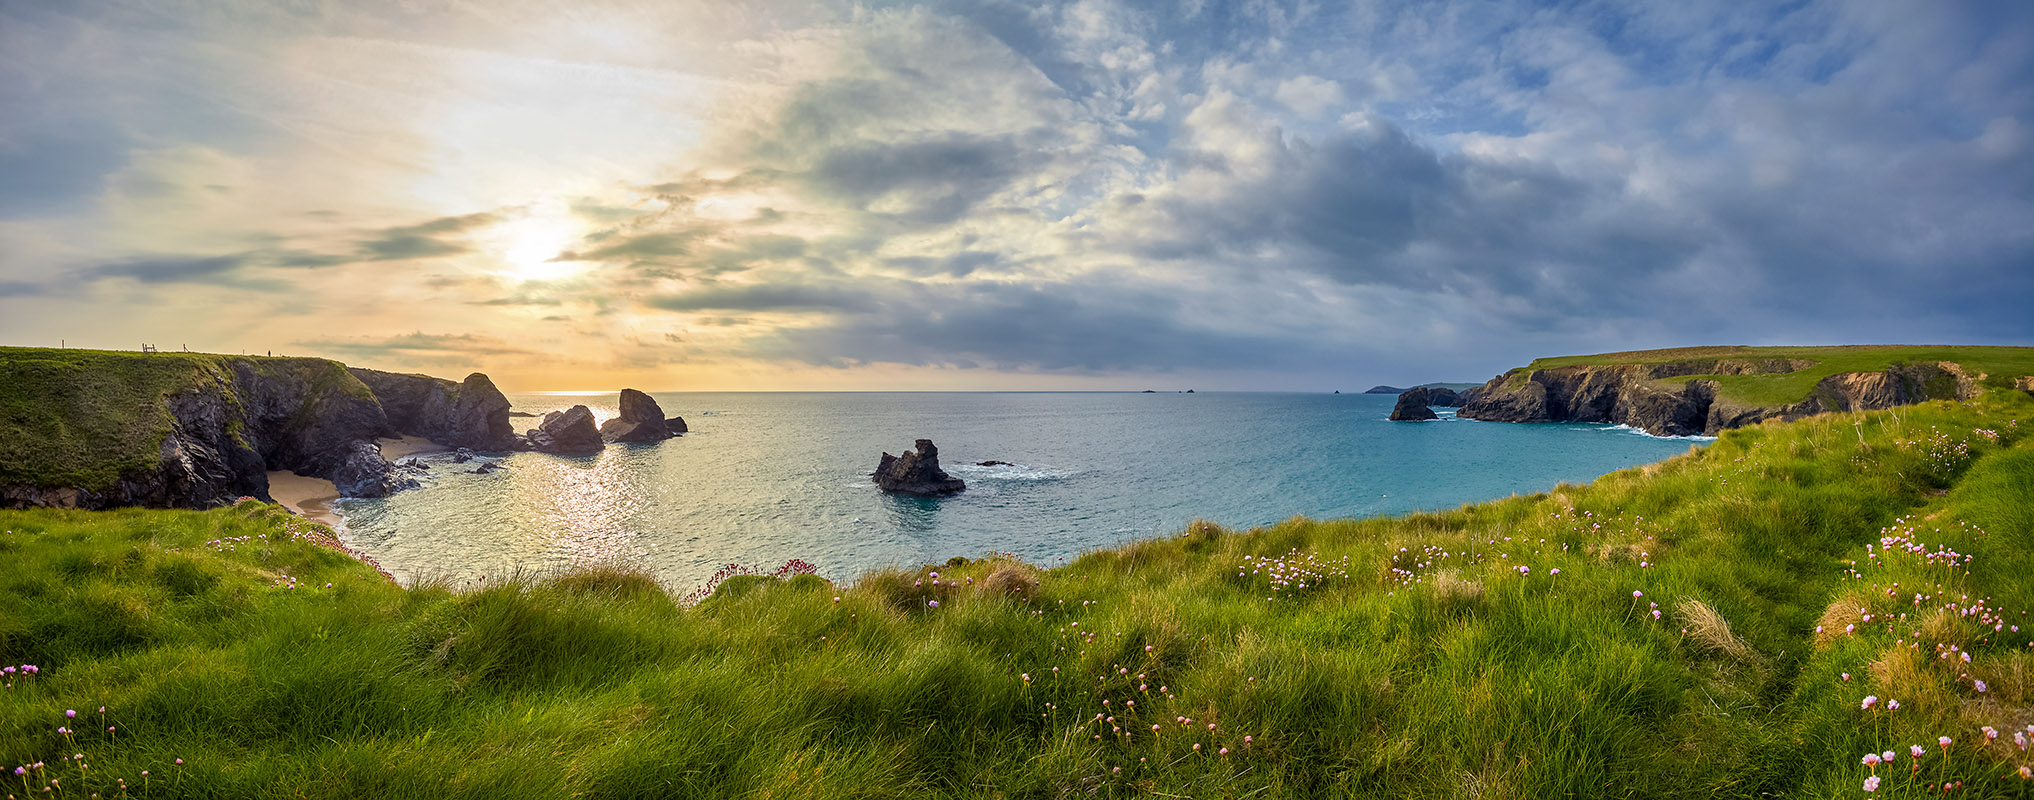 Cornwalls grüne Küste